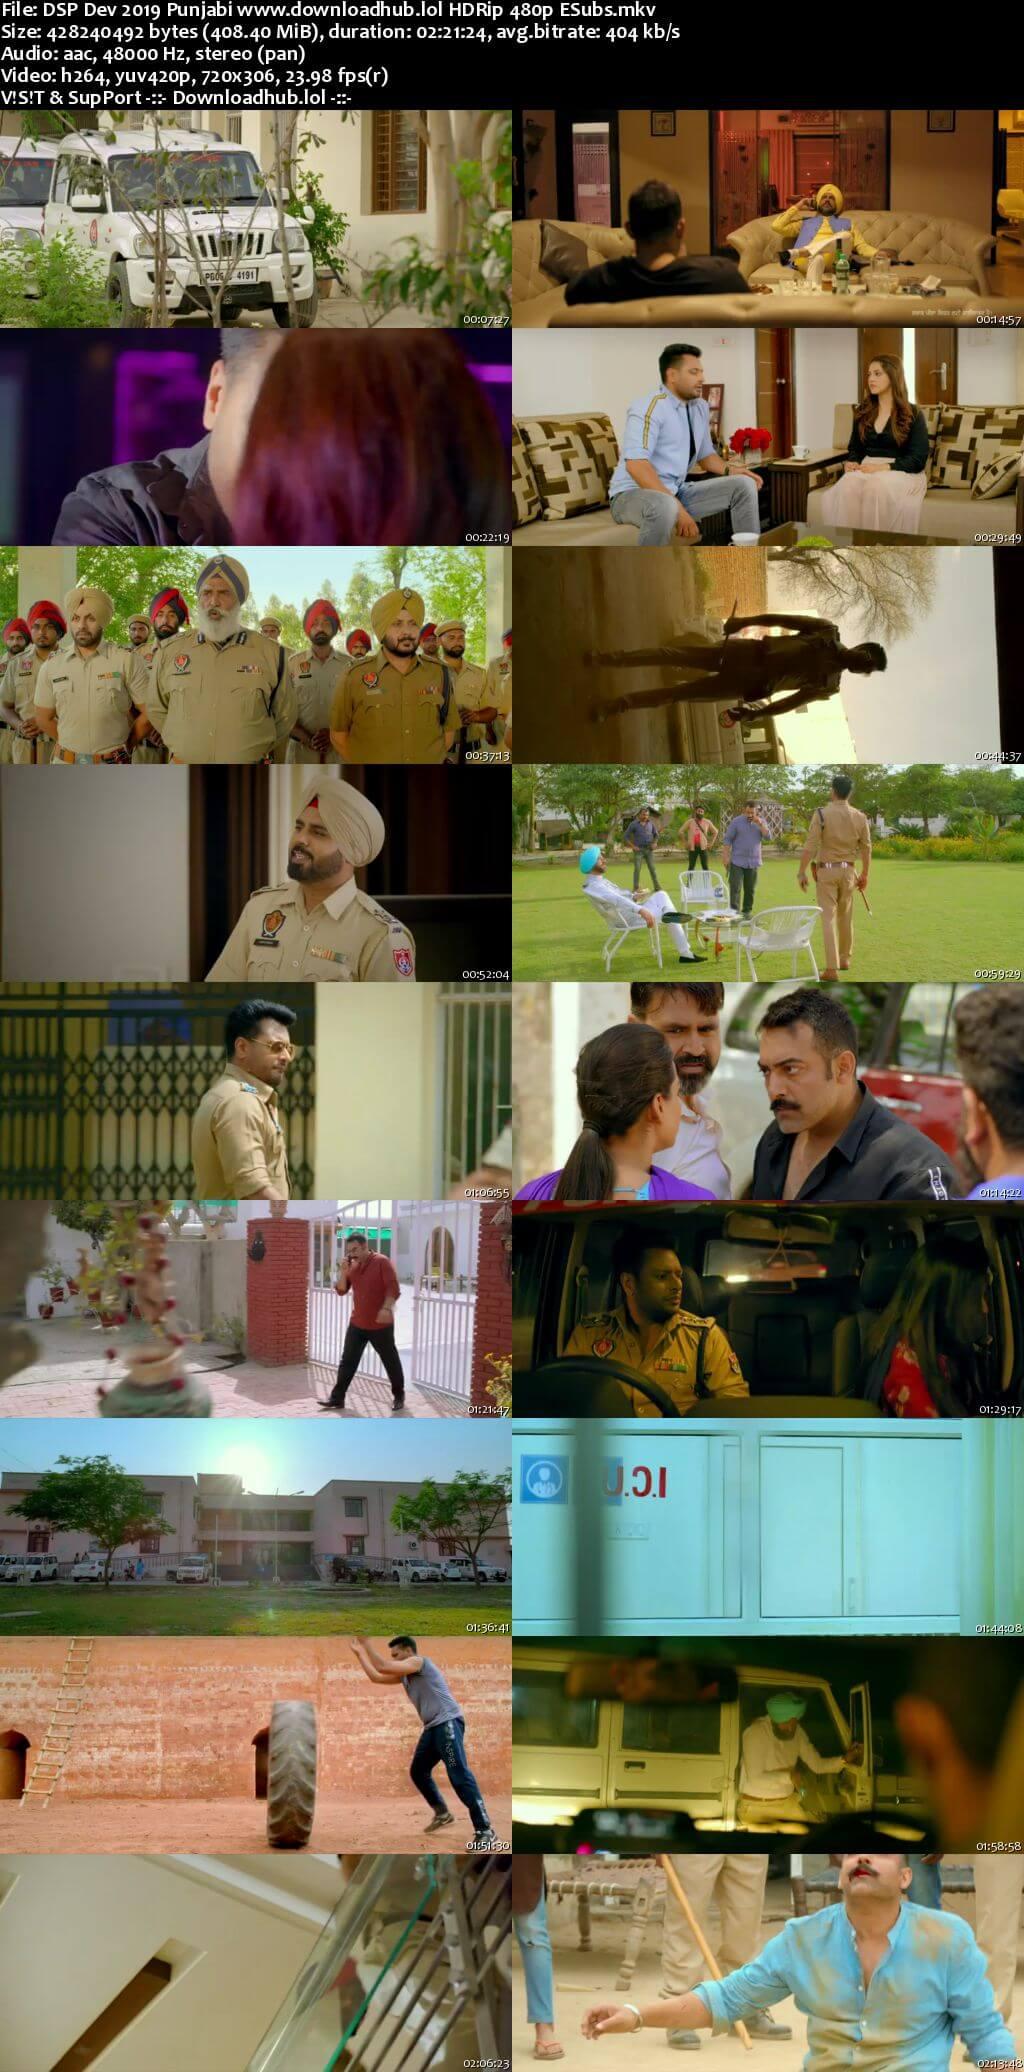 DSP Dev 2019 Punjabi 400MB HDRip 480p ESubs